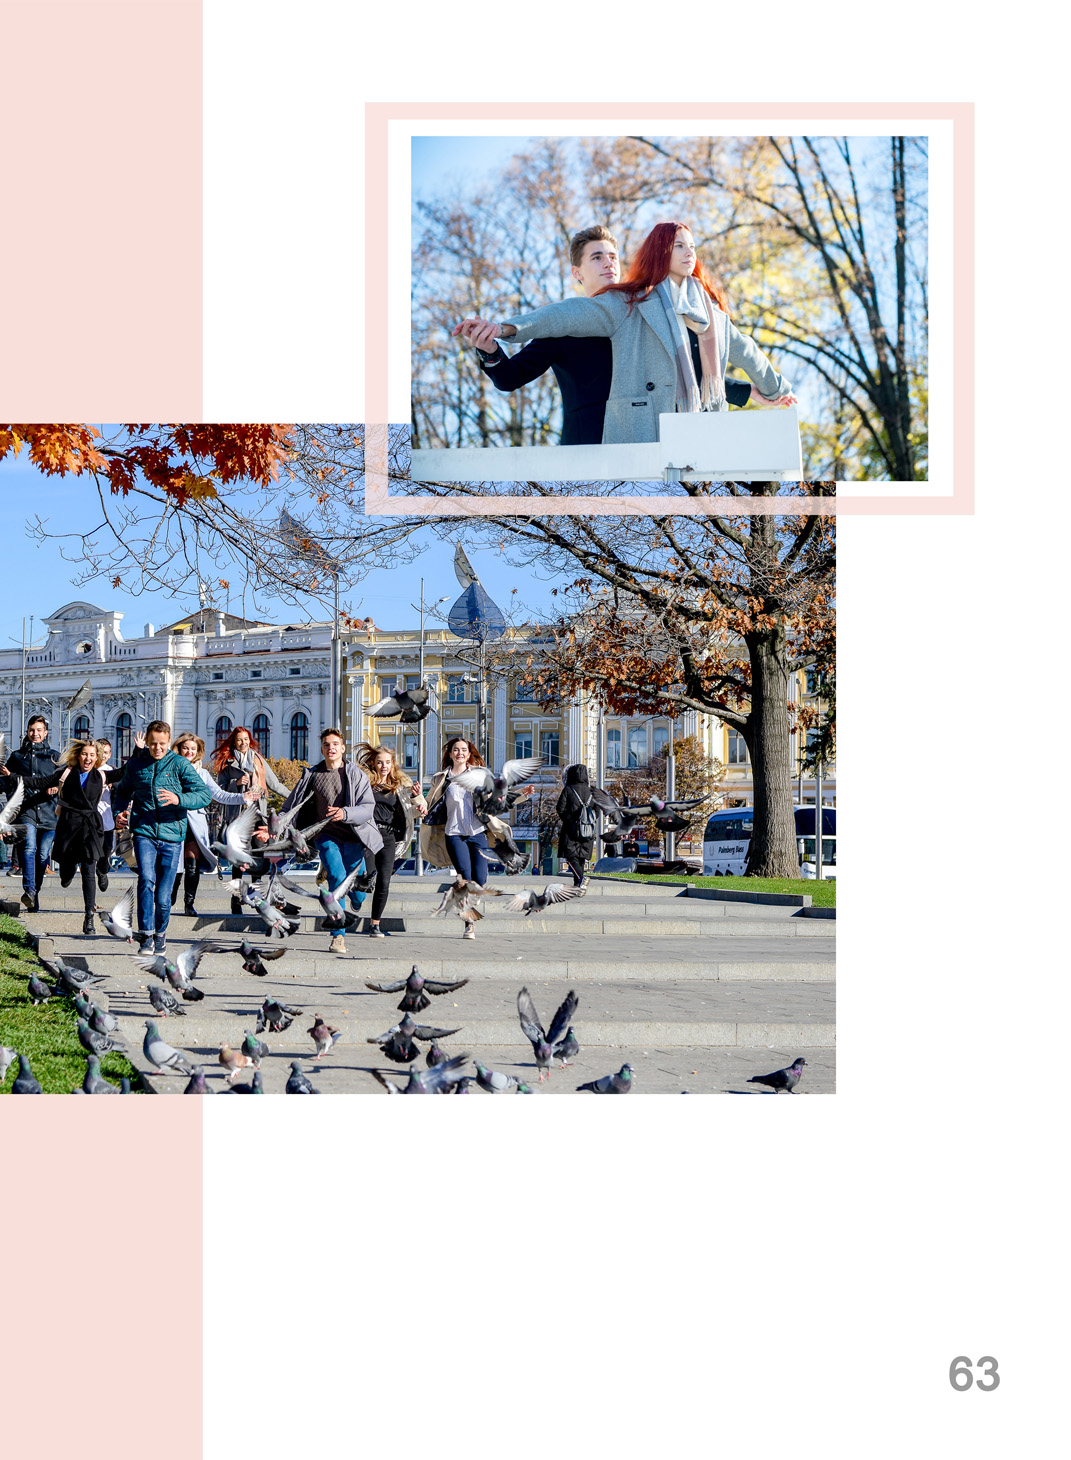 https://school-photo.com.ua/wp-content/uploads/2019/09/65-copy.jpg